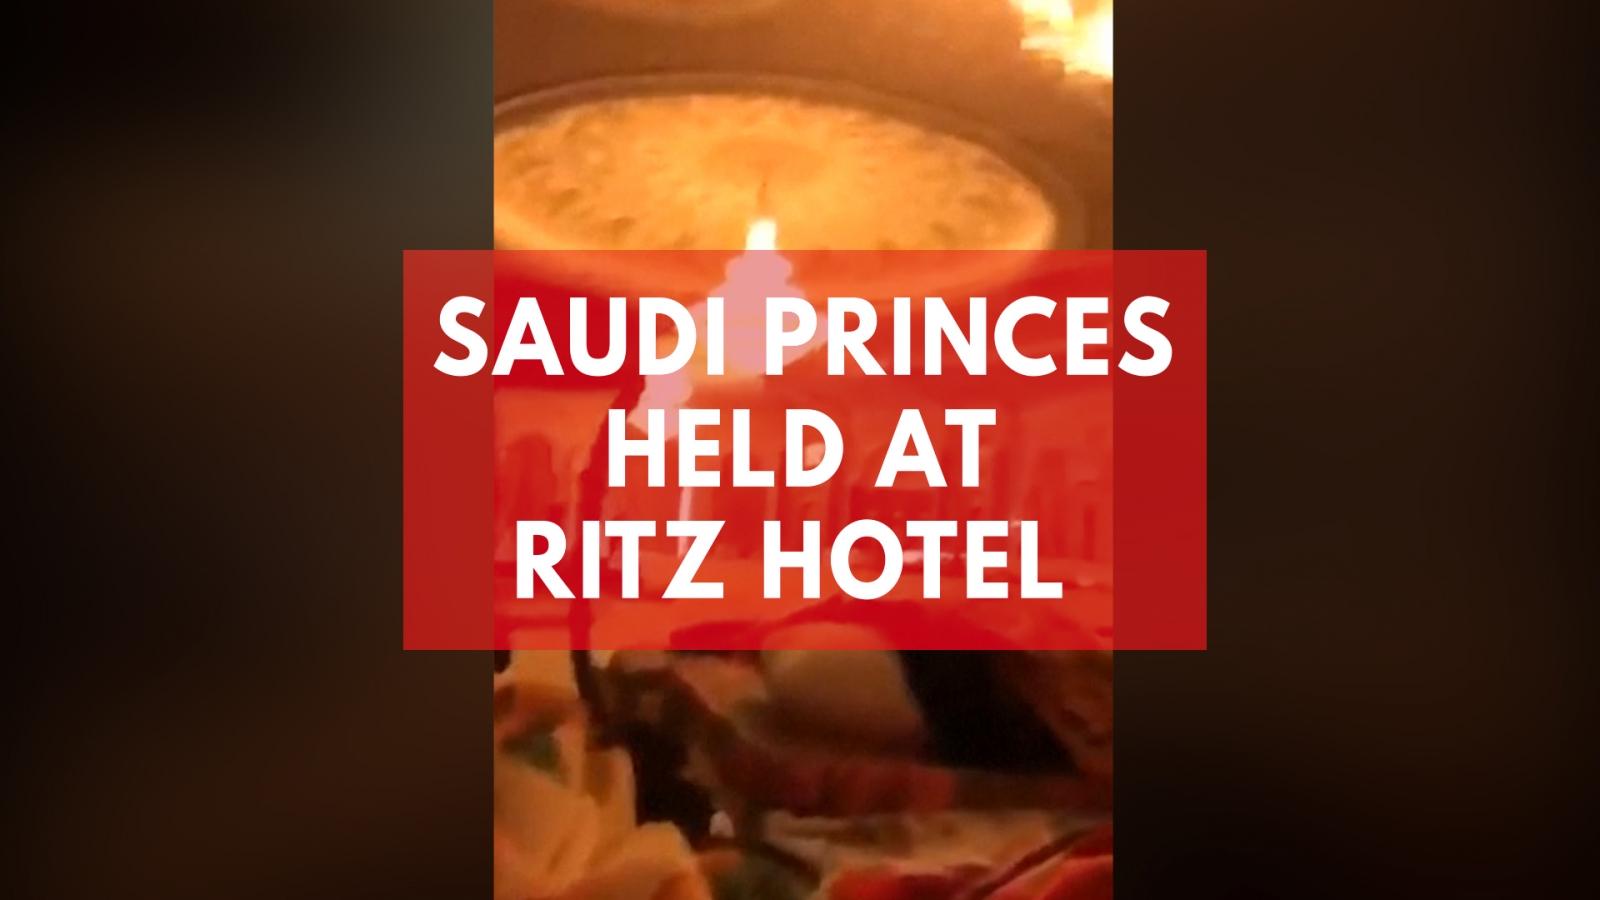 saudi-princes-held-at-ritz-hotel-in-corruption-crackdown